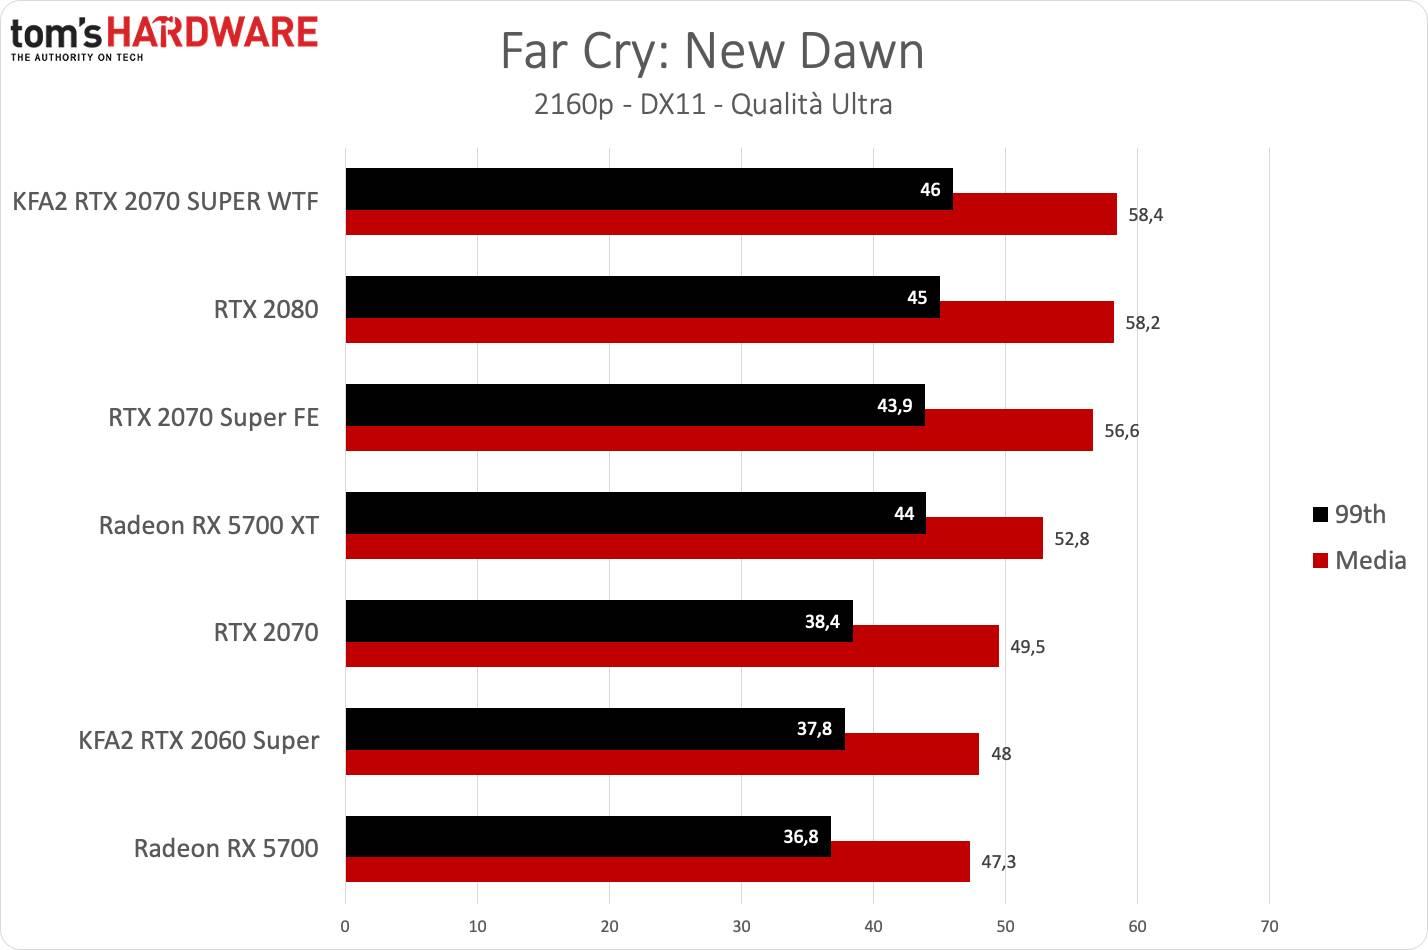 KFA2 RTX 2070 SUPER WTF - Far Cry UHD